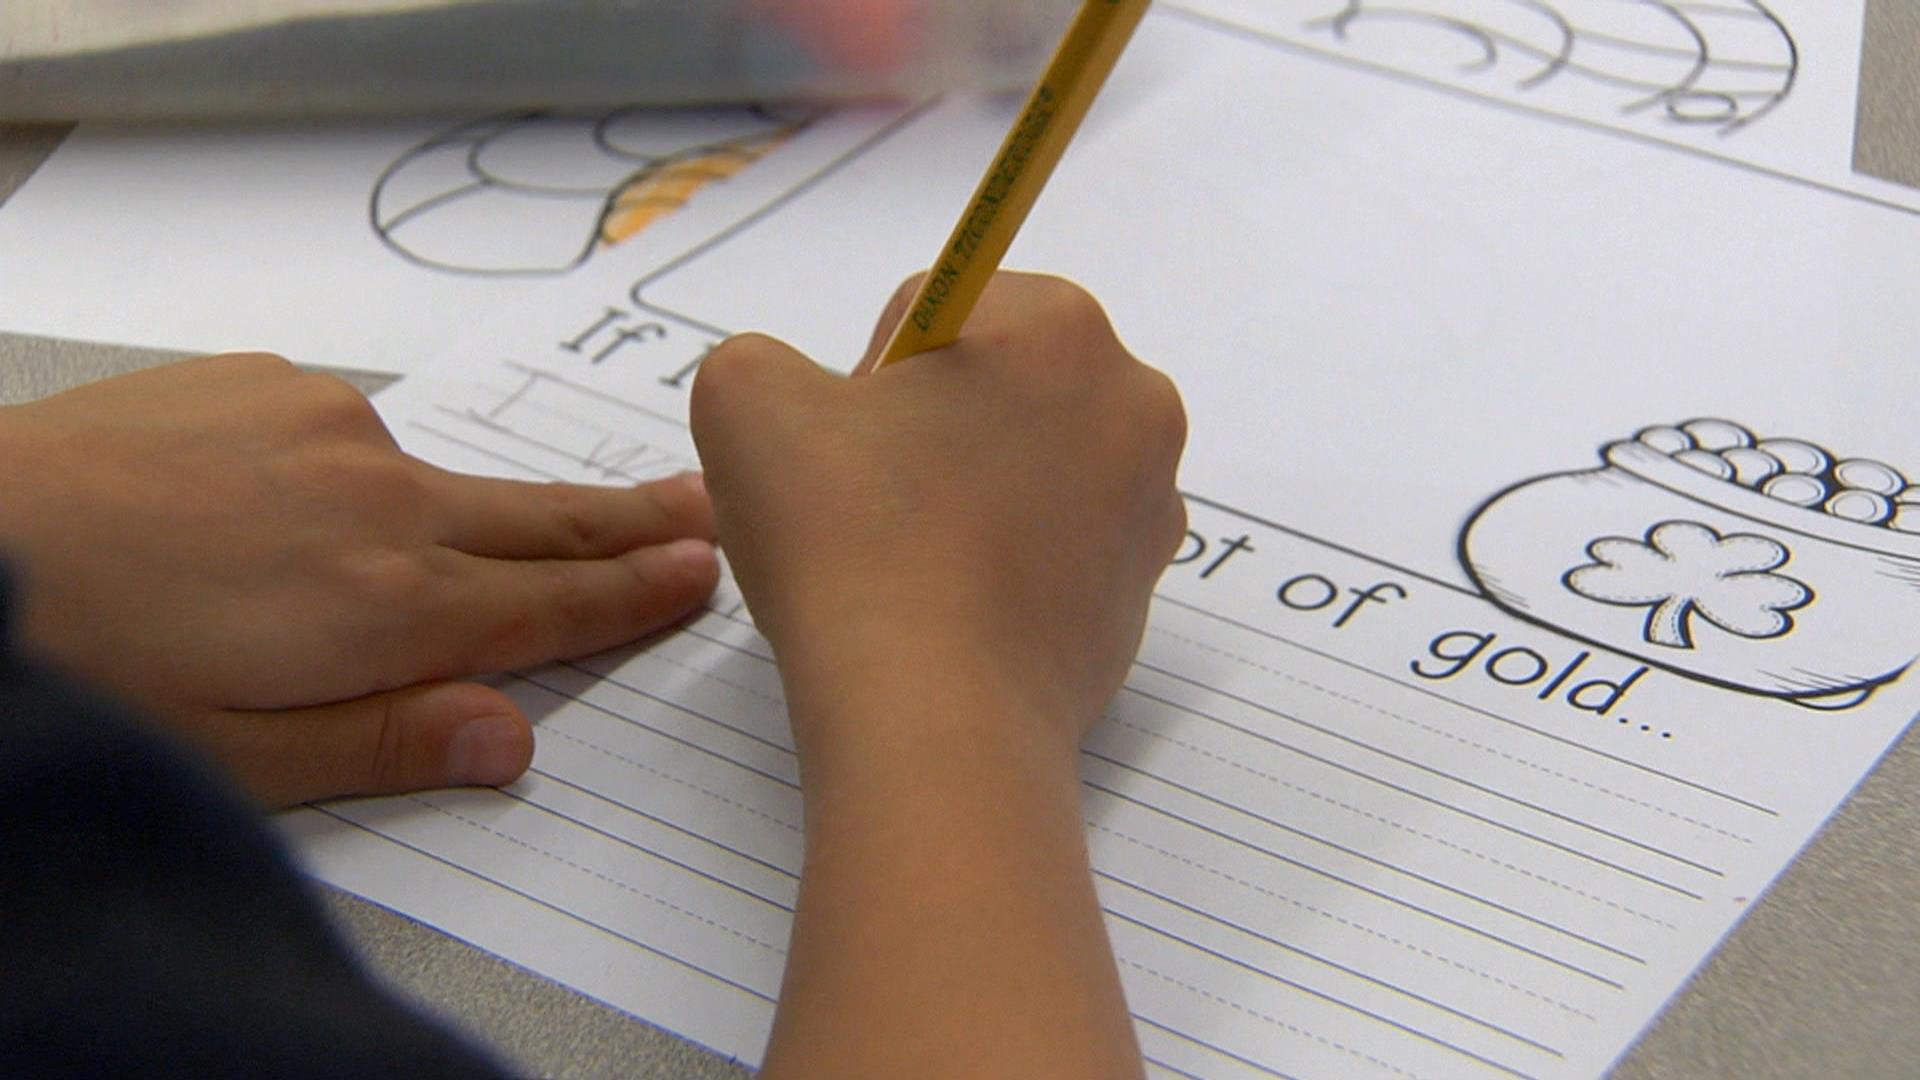 Teachers, parents just say no to elementary school homework